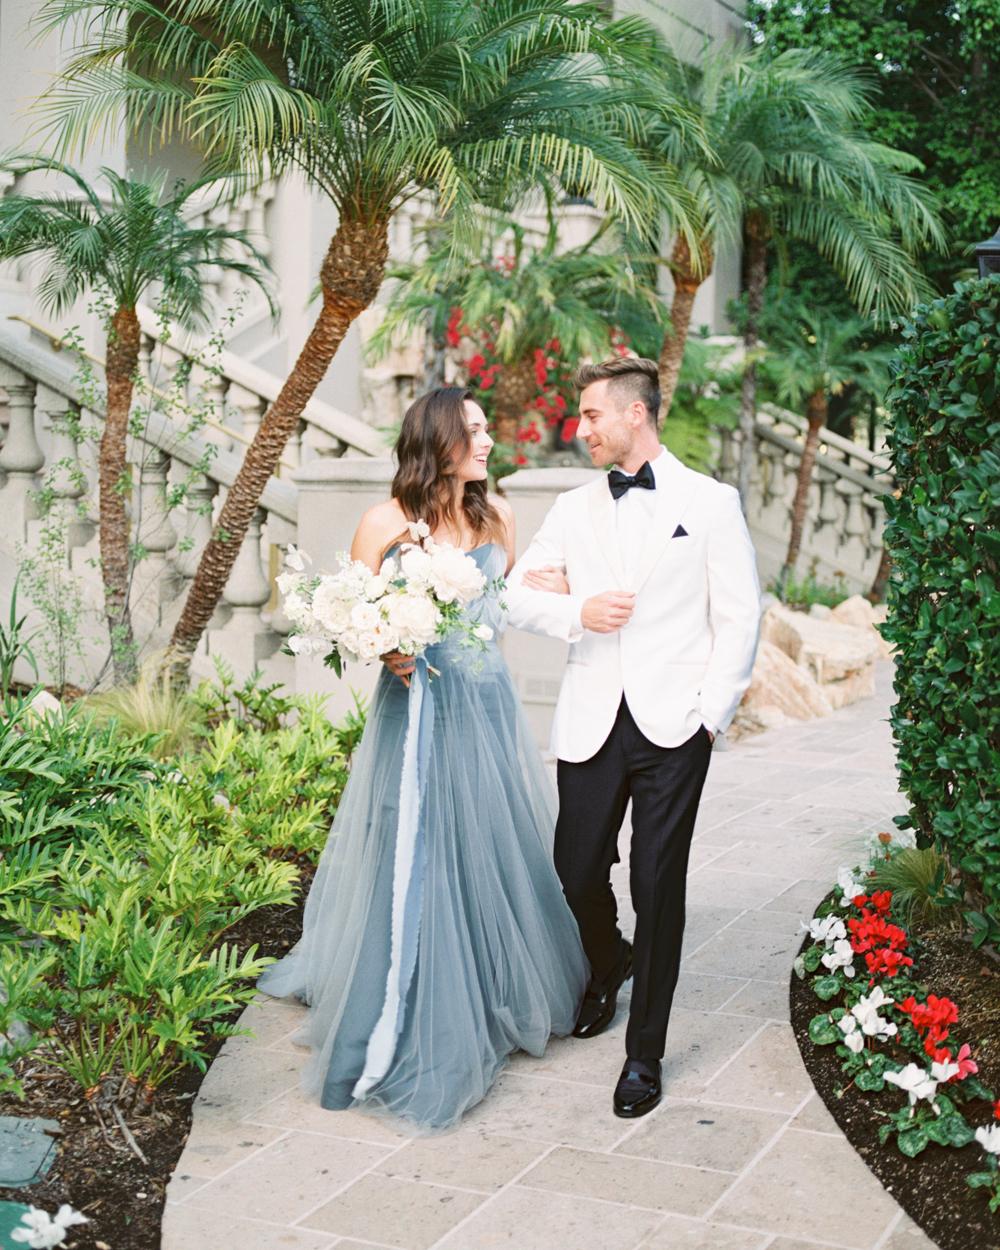 AKP_Los_Angeles_Film_Wedding_Photographer_Ritz_Carlton_Marina_del_Rey_cover-23.jpg